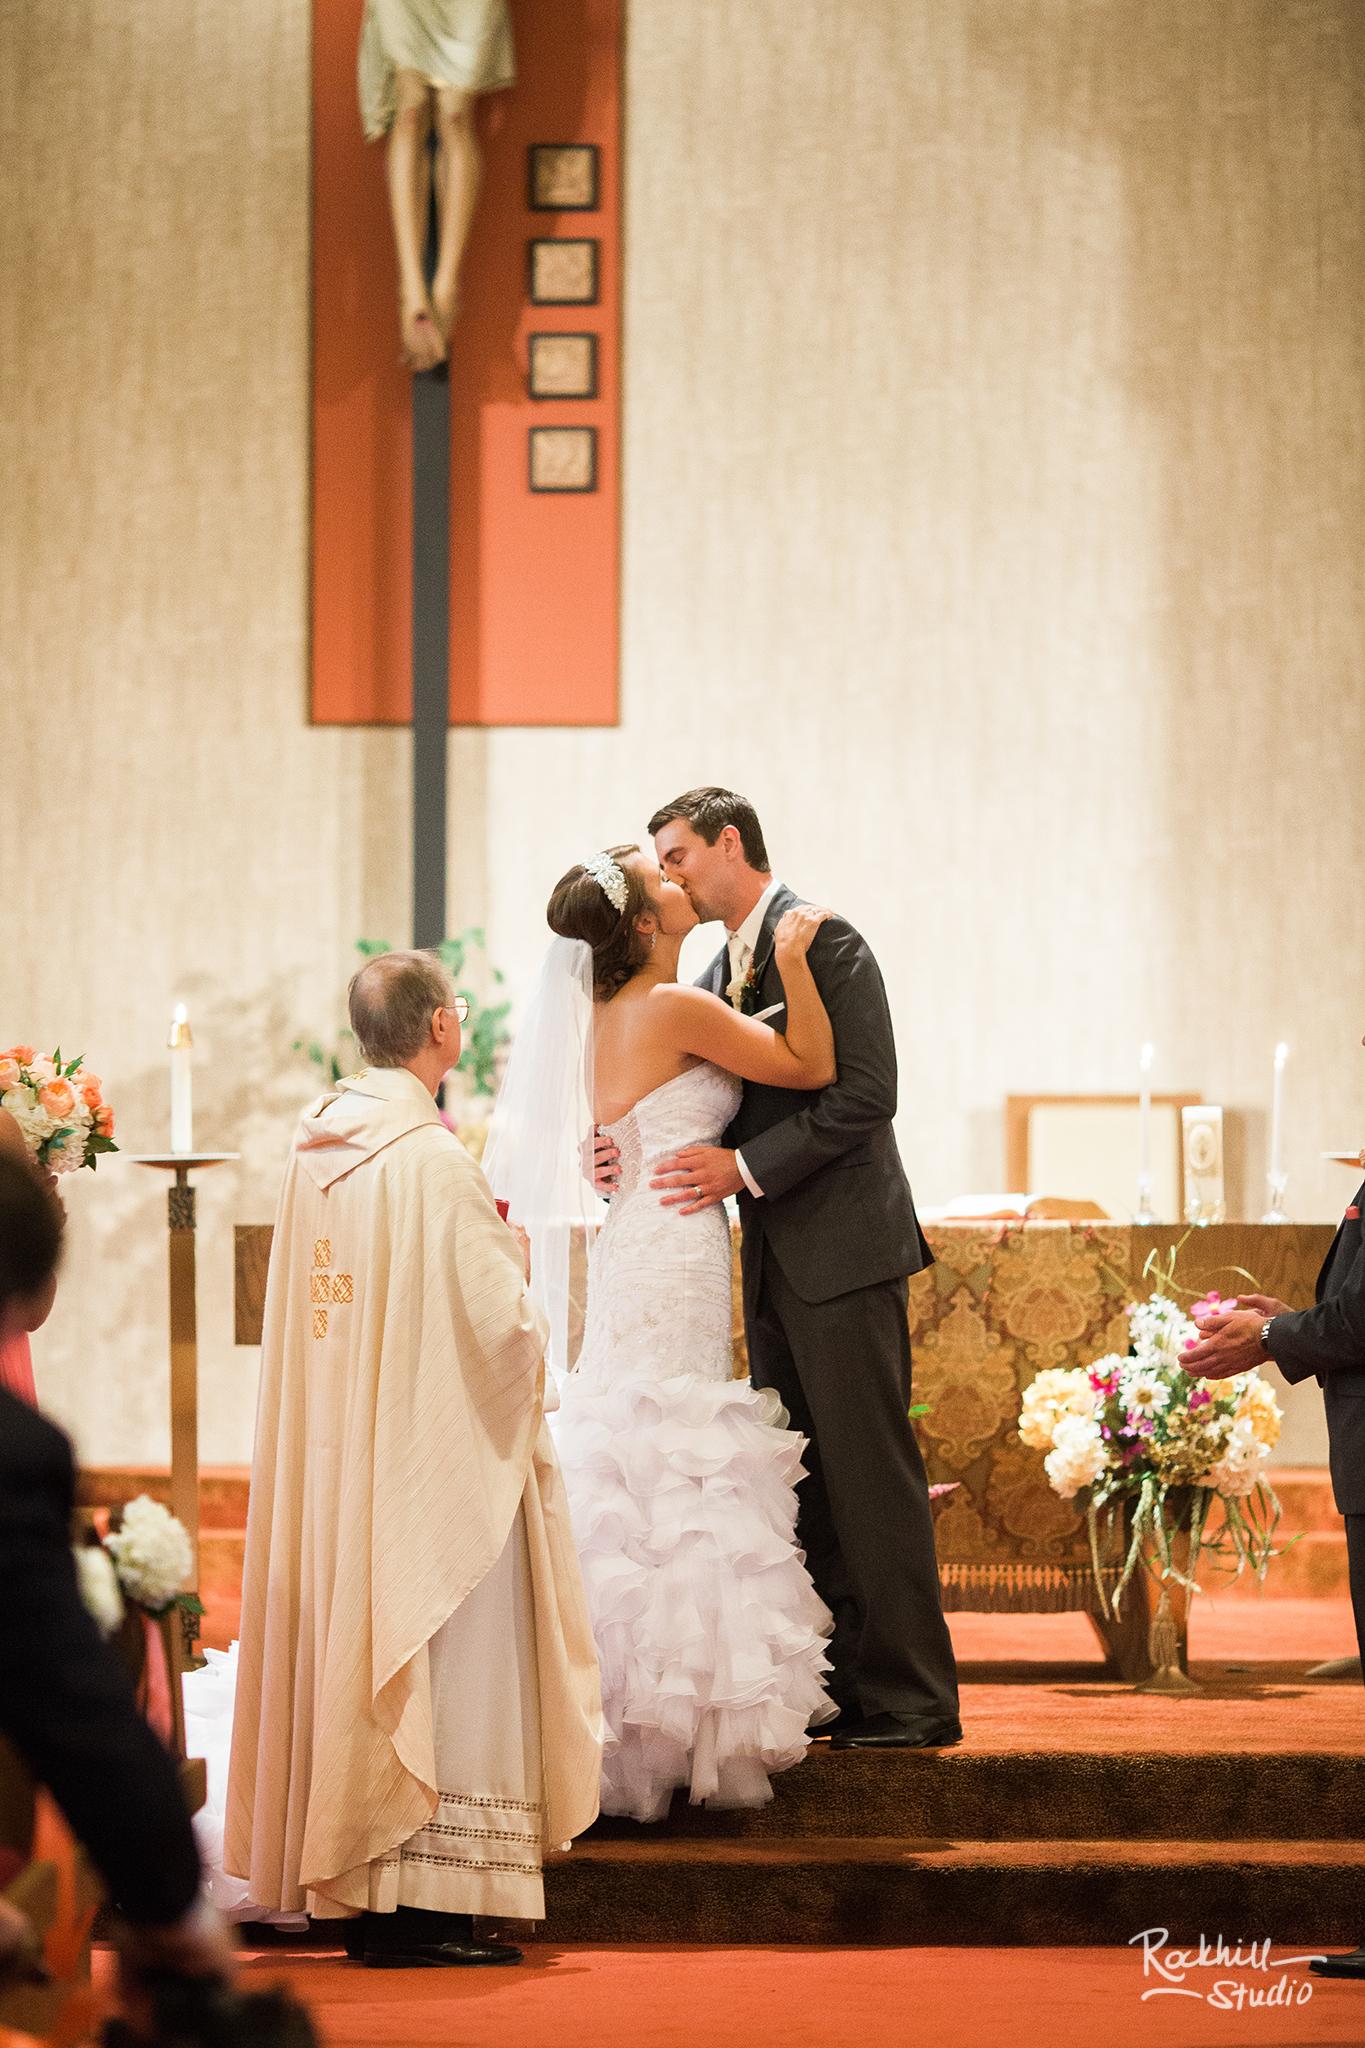 marquette-wedding-upper-peninsula-northern-michigan-wedding-ck-photography-wedding-party-10.jpg